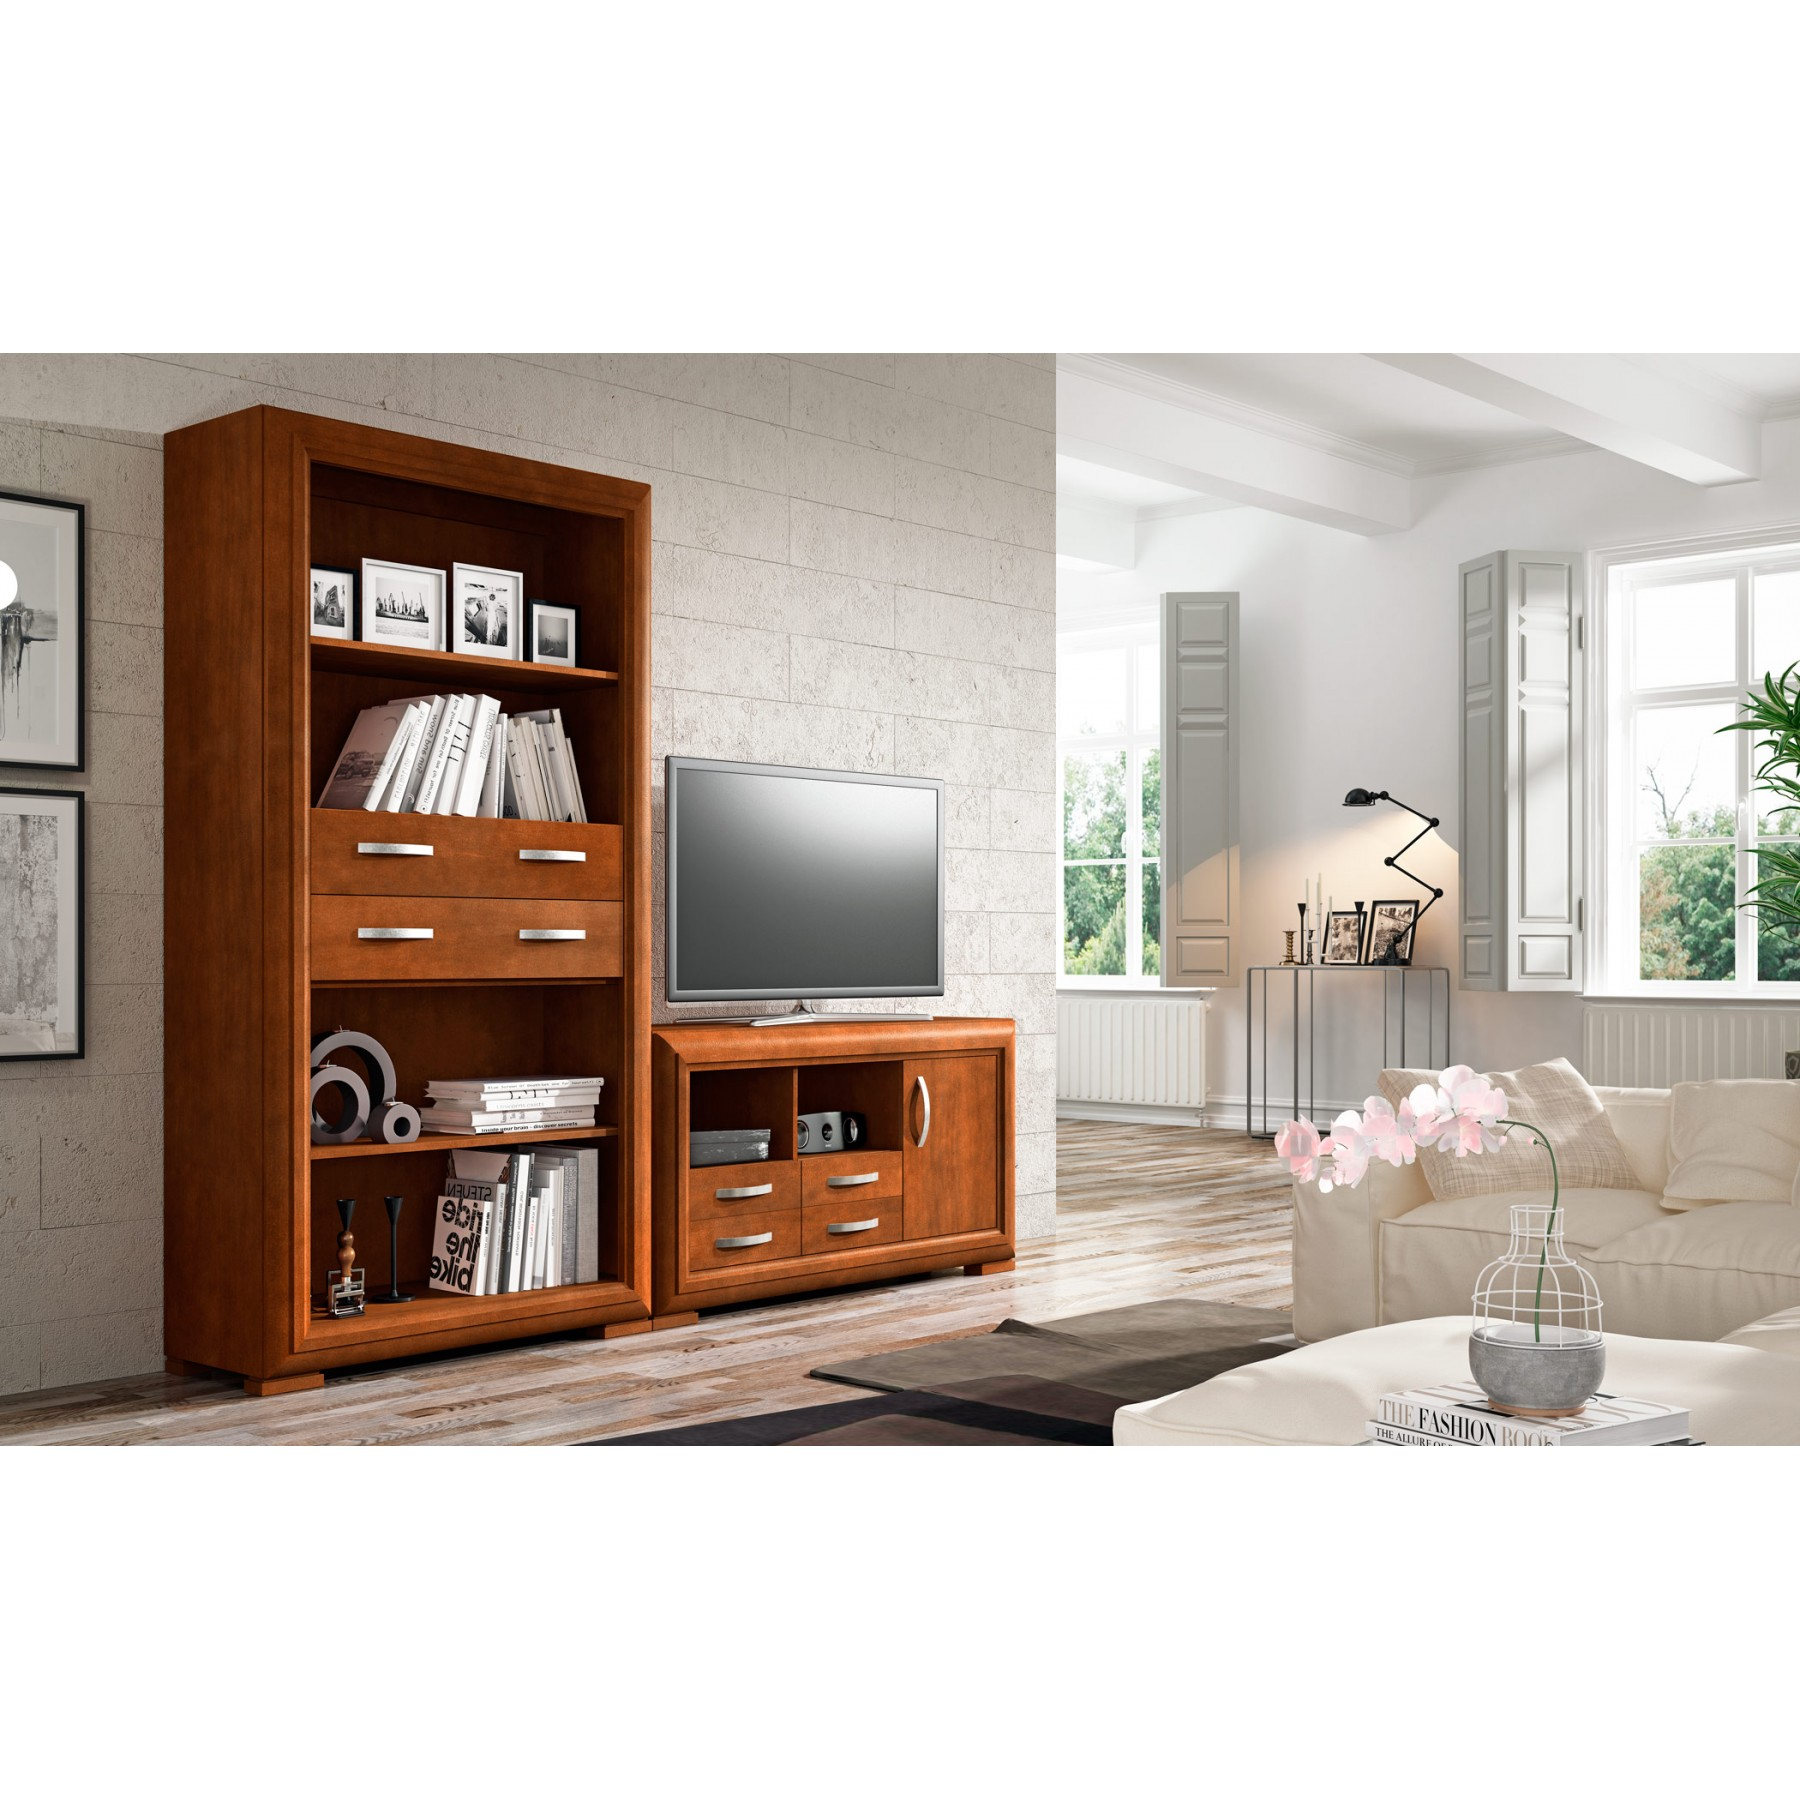 Conjunto muebles de sal n modelo arbeia for Modelos de muebles de salon